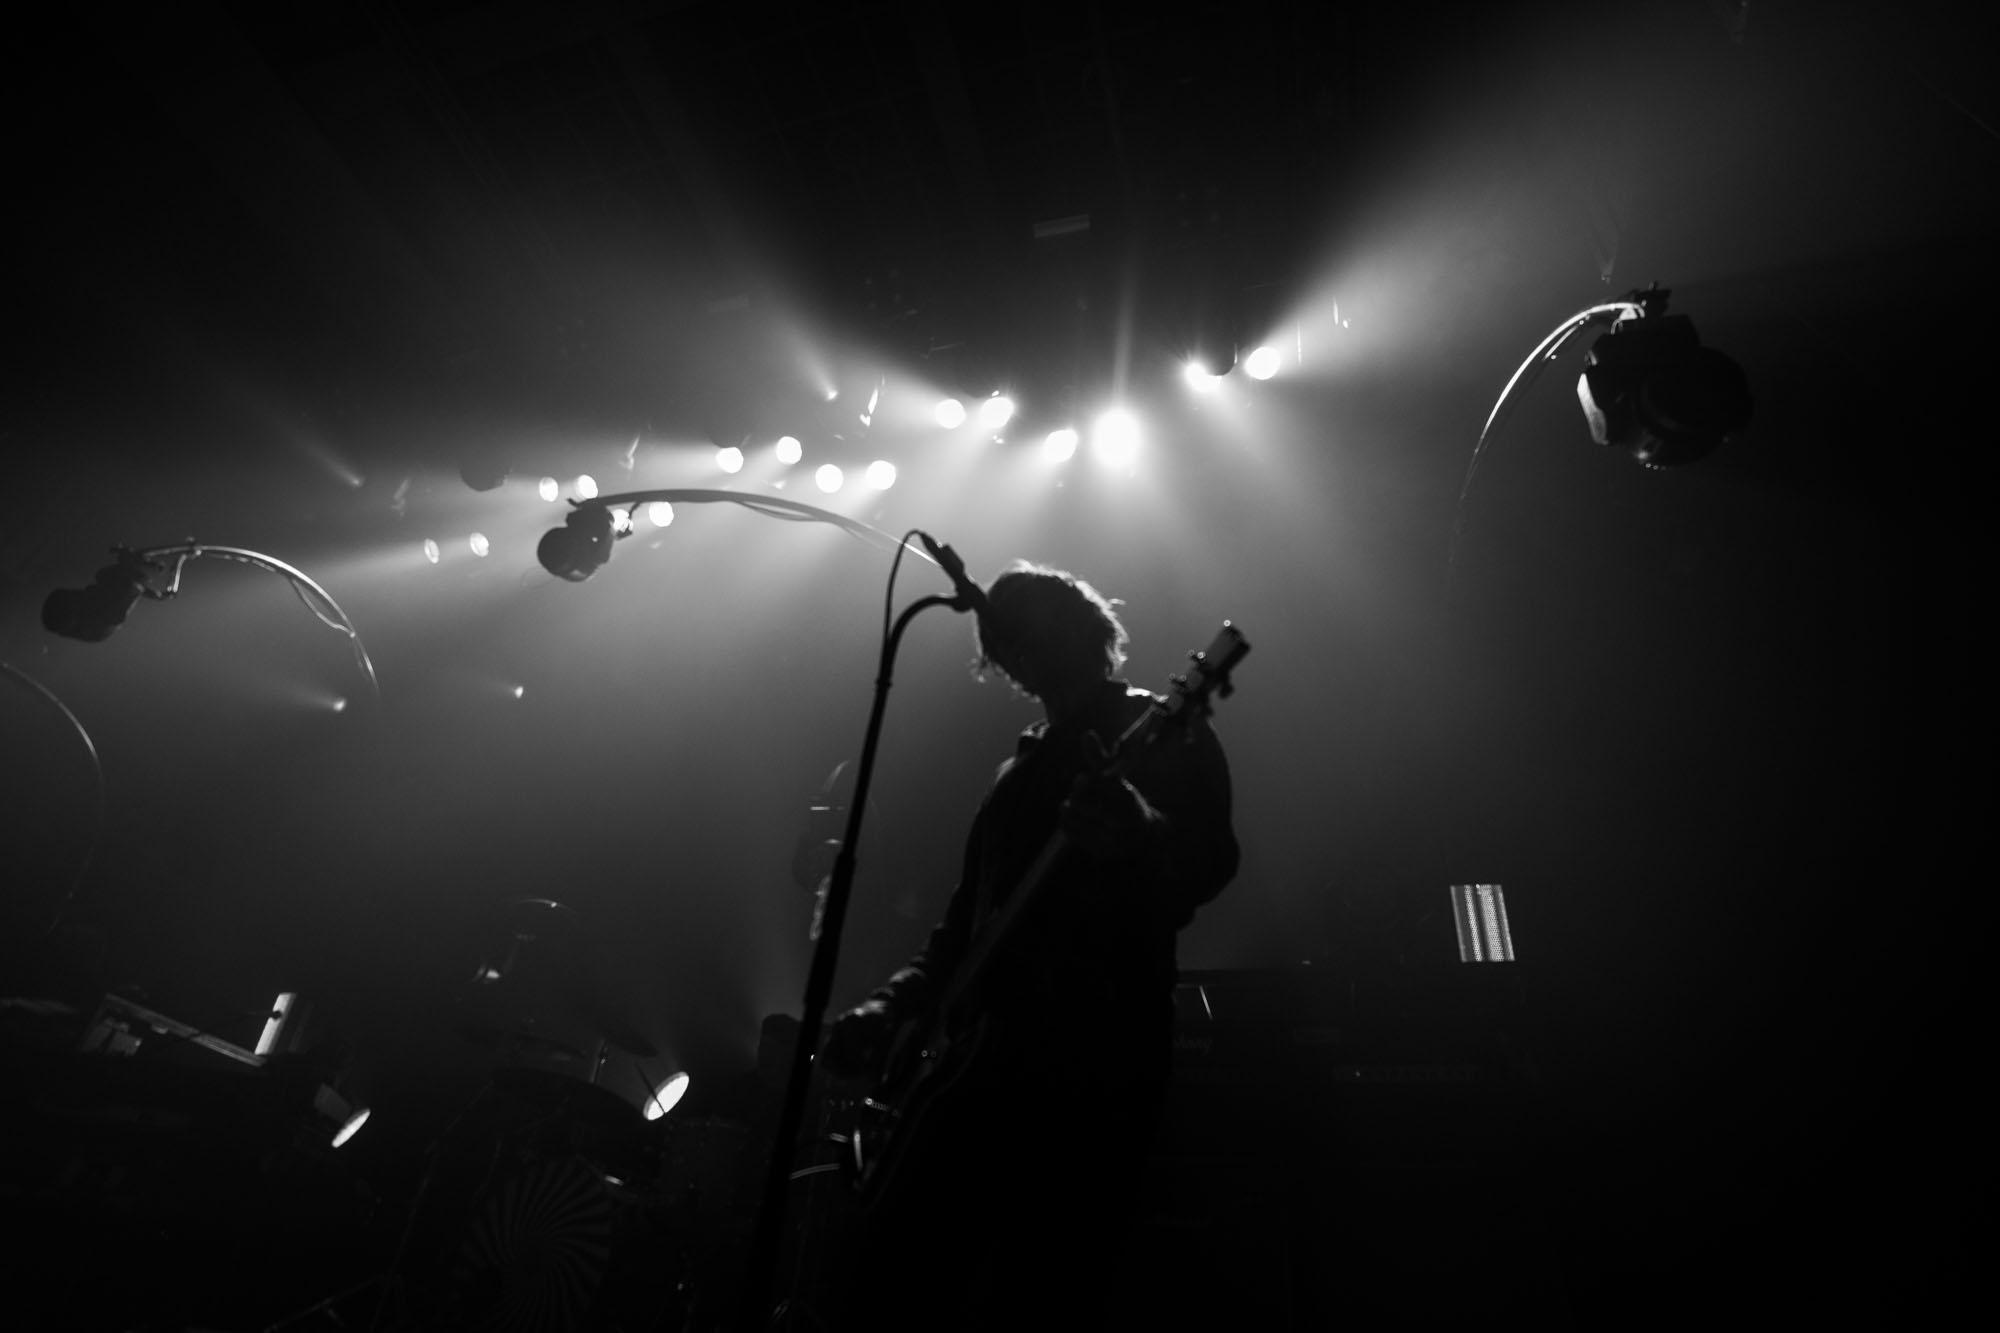 081281-Studioscape.org-PhotoByOivindSvendsen-Norway-Oslo-Rockefeller-DumDum Boys-2